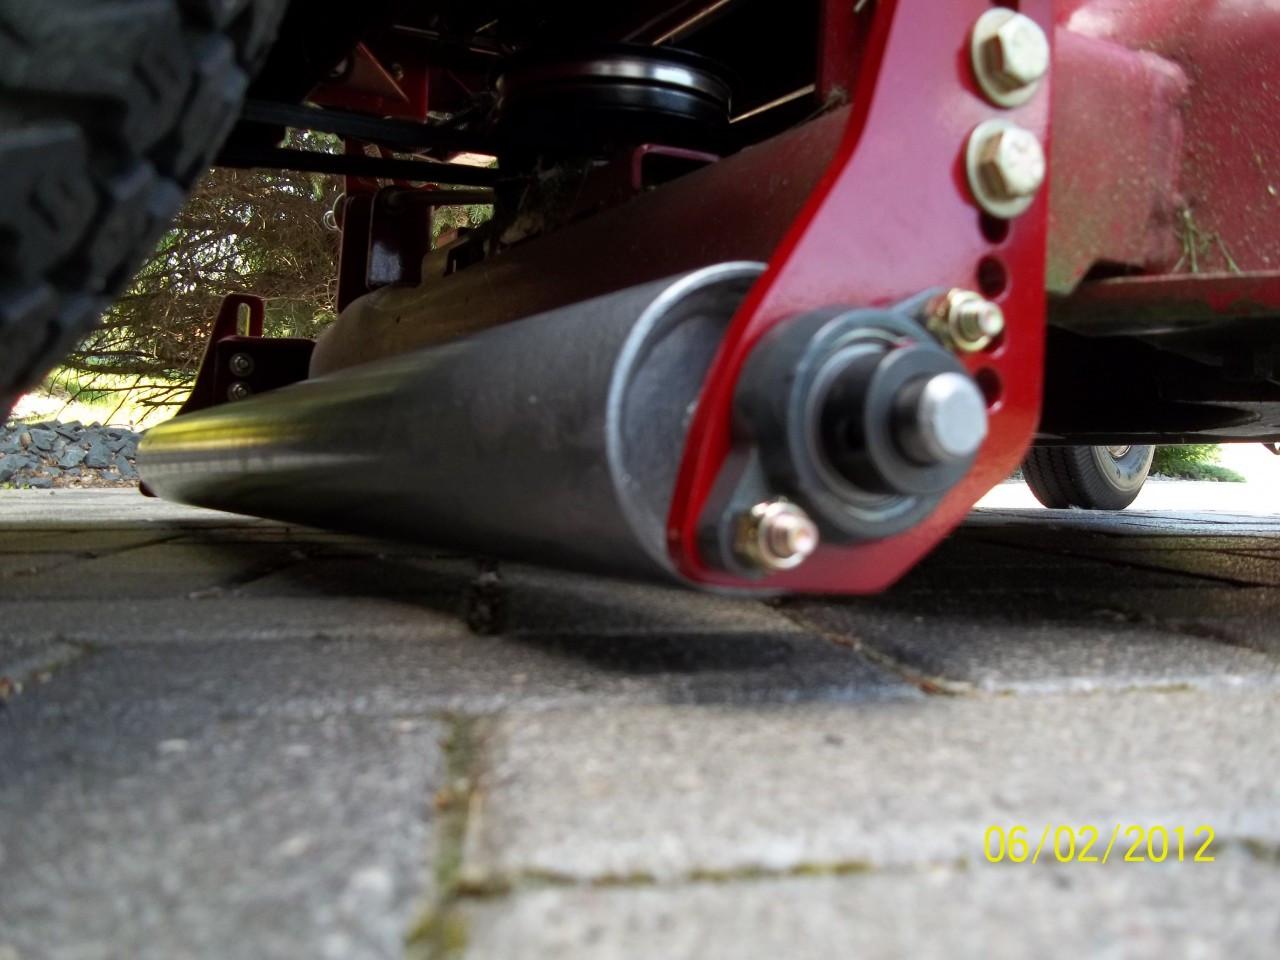 "Installed lawn striper on Toro Timecutter 44"" deck."